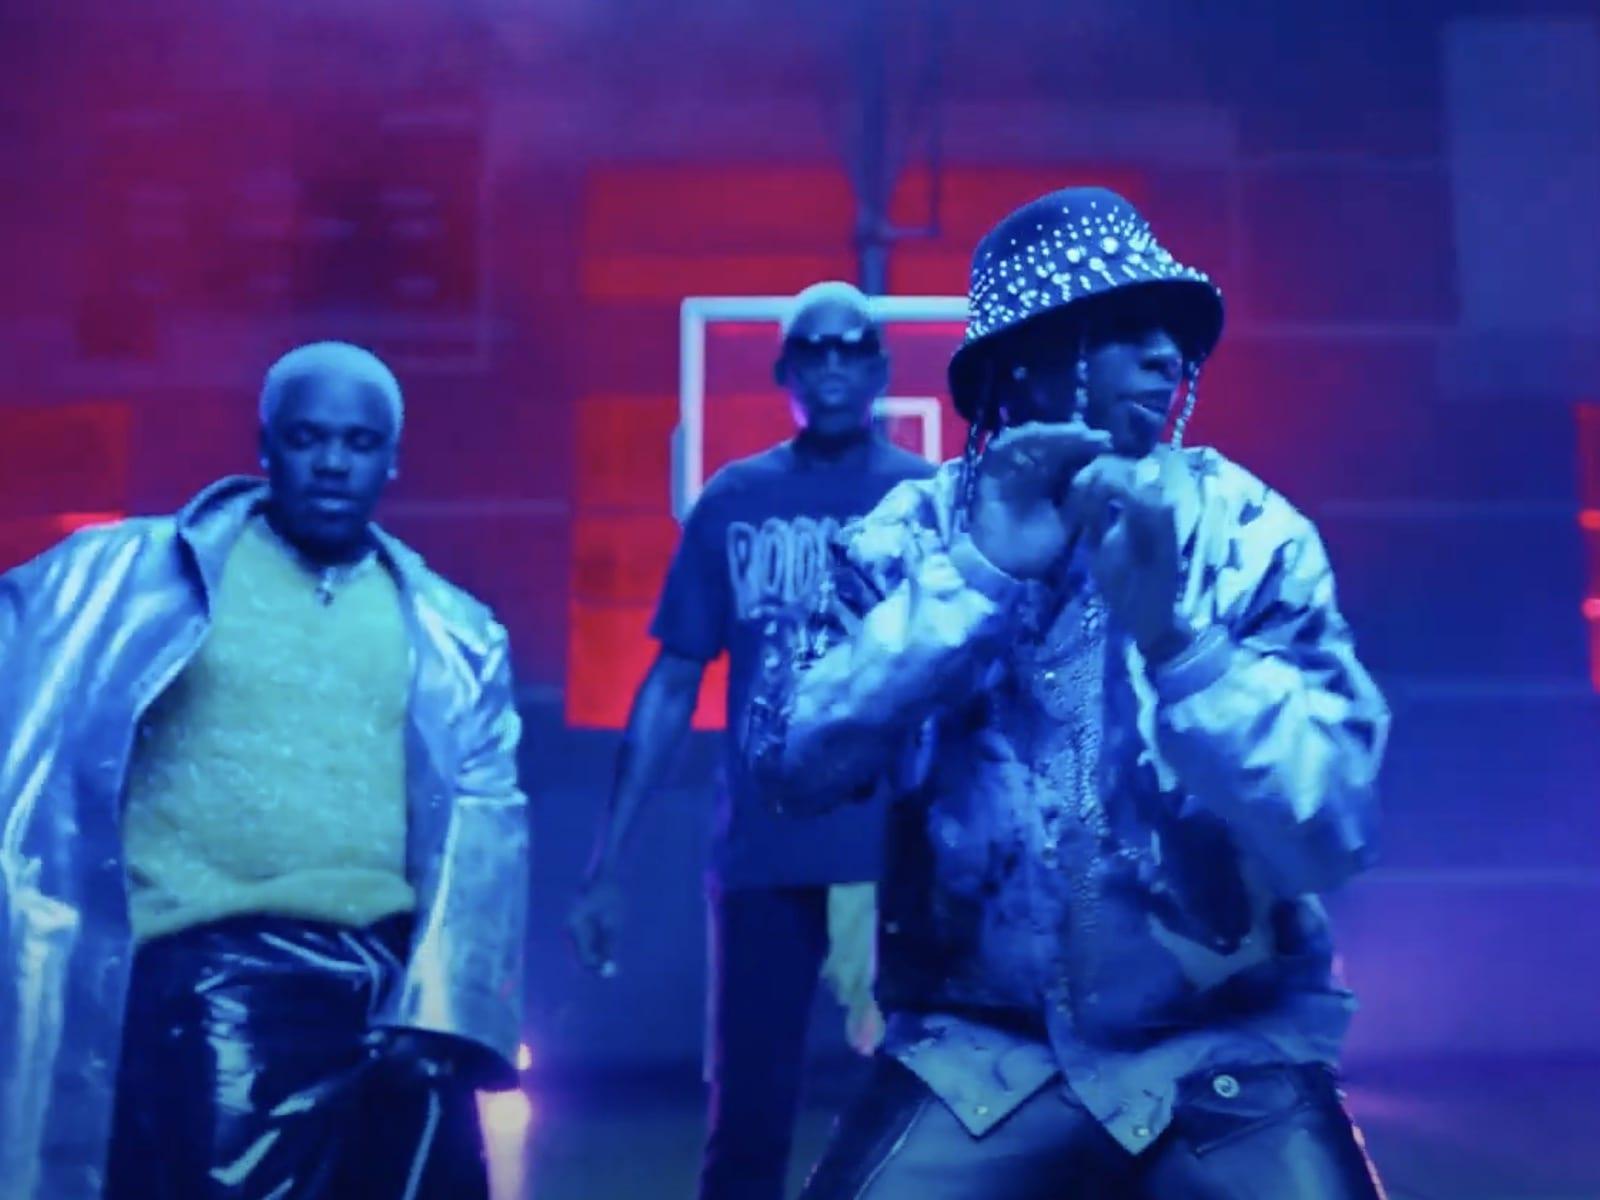 Dennis Rodman Music Video A$AP Ferg Tyga 11